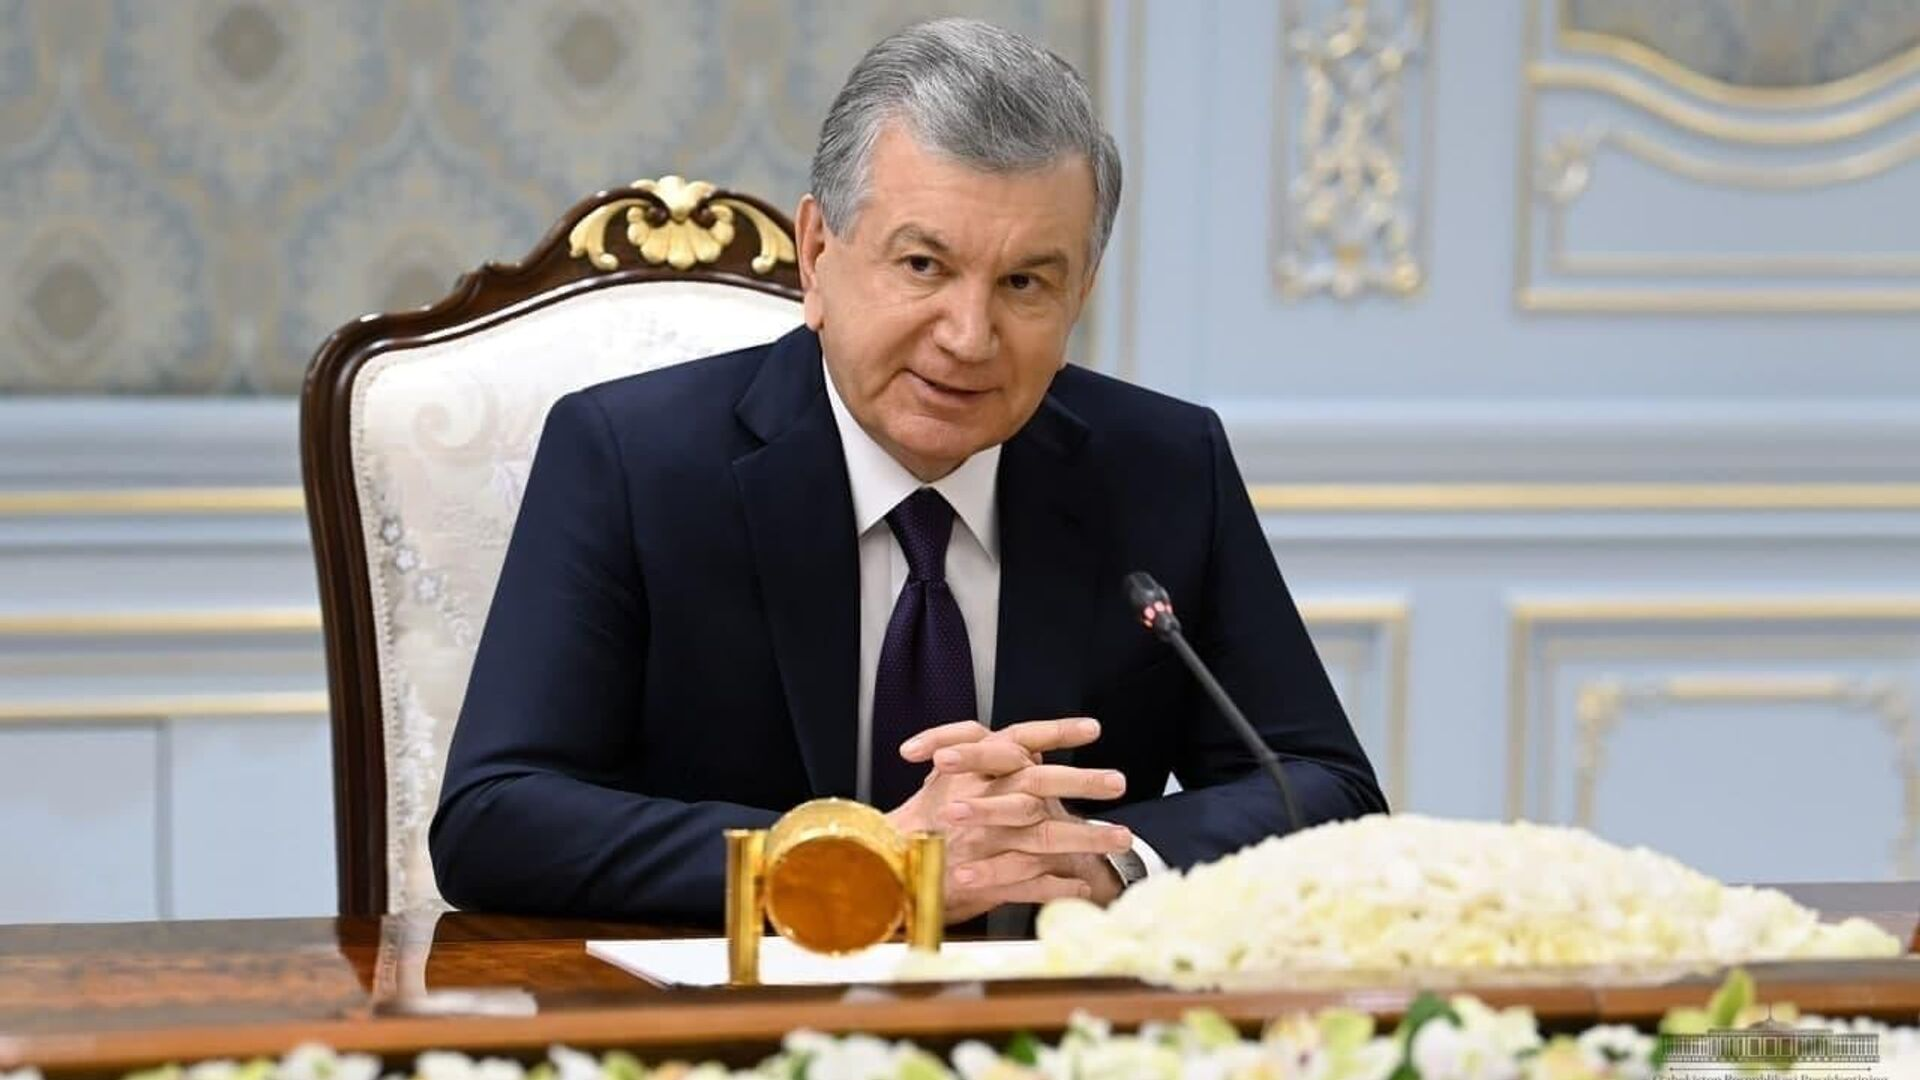 Президент Узбекистана Шавкат Мирзиёев - Sputnik Ўзбекистон, 1920, 15.09.2021